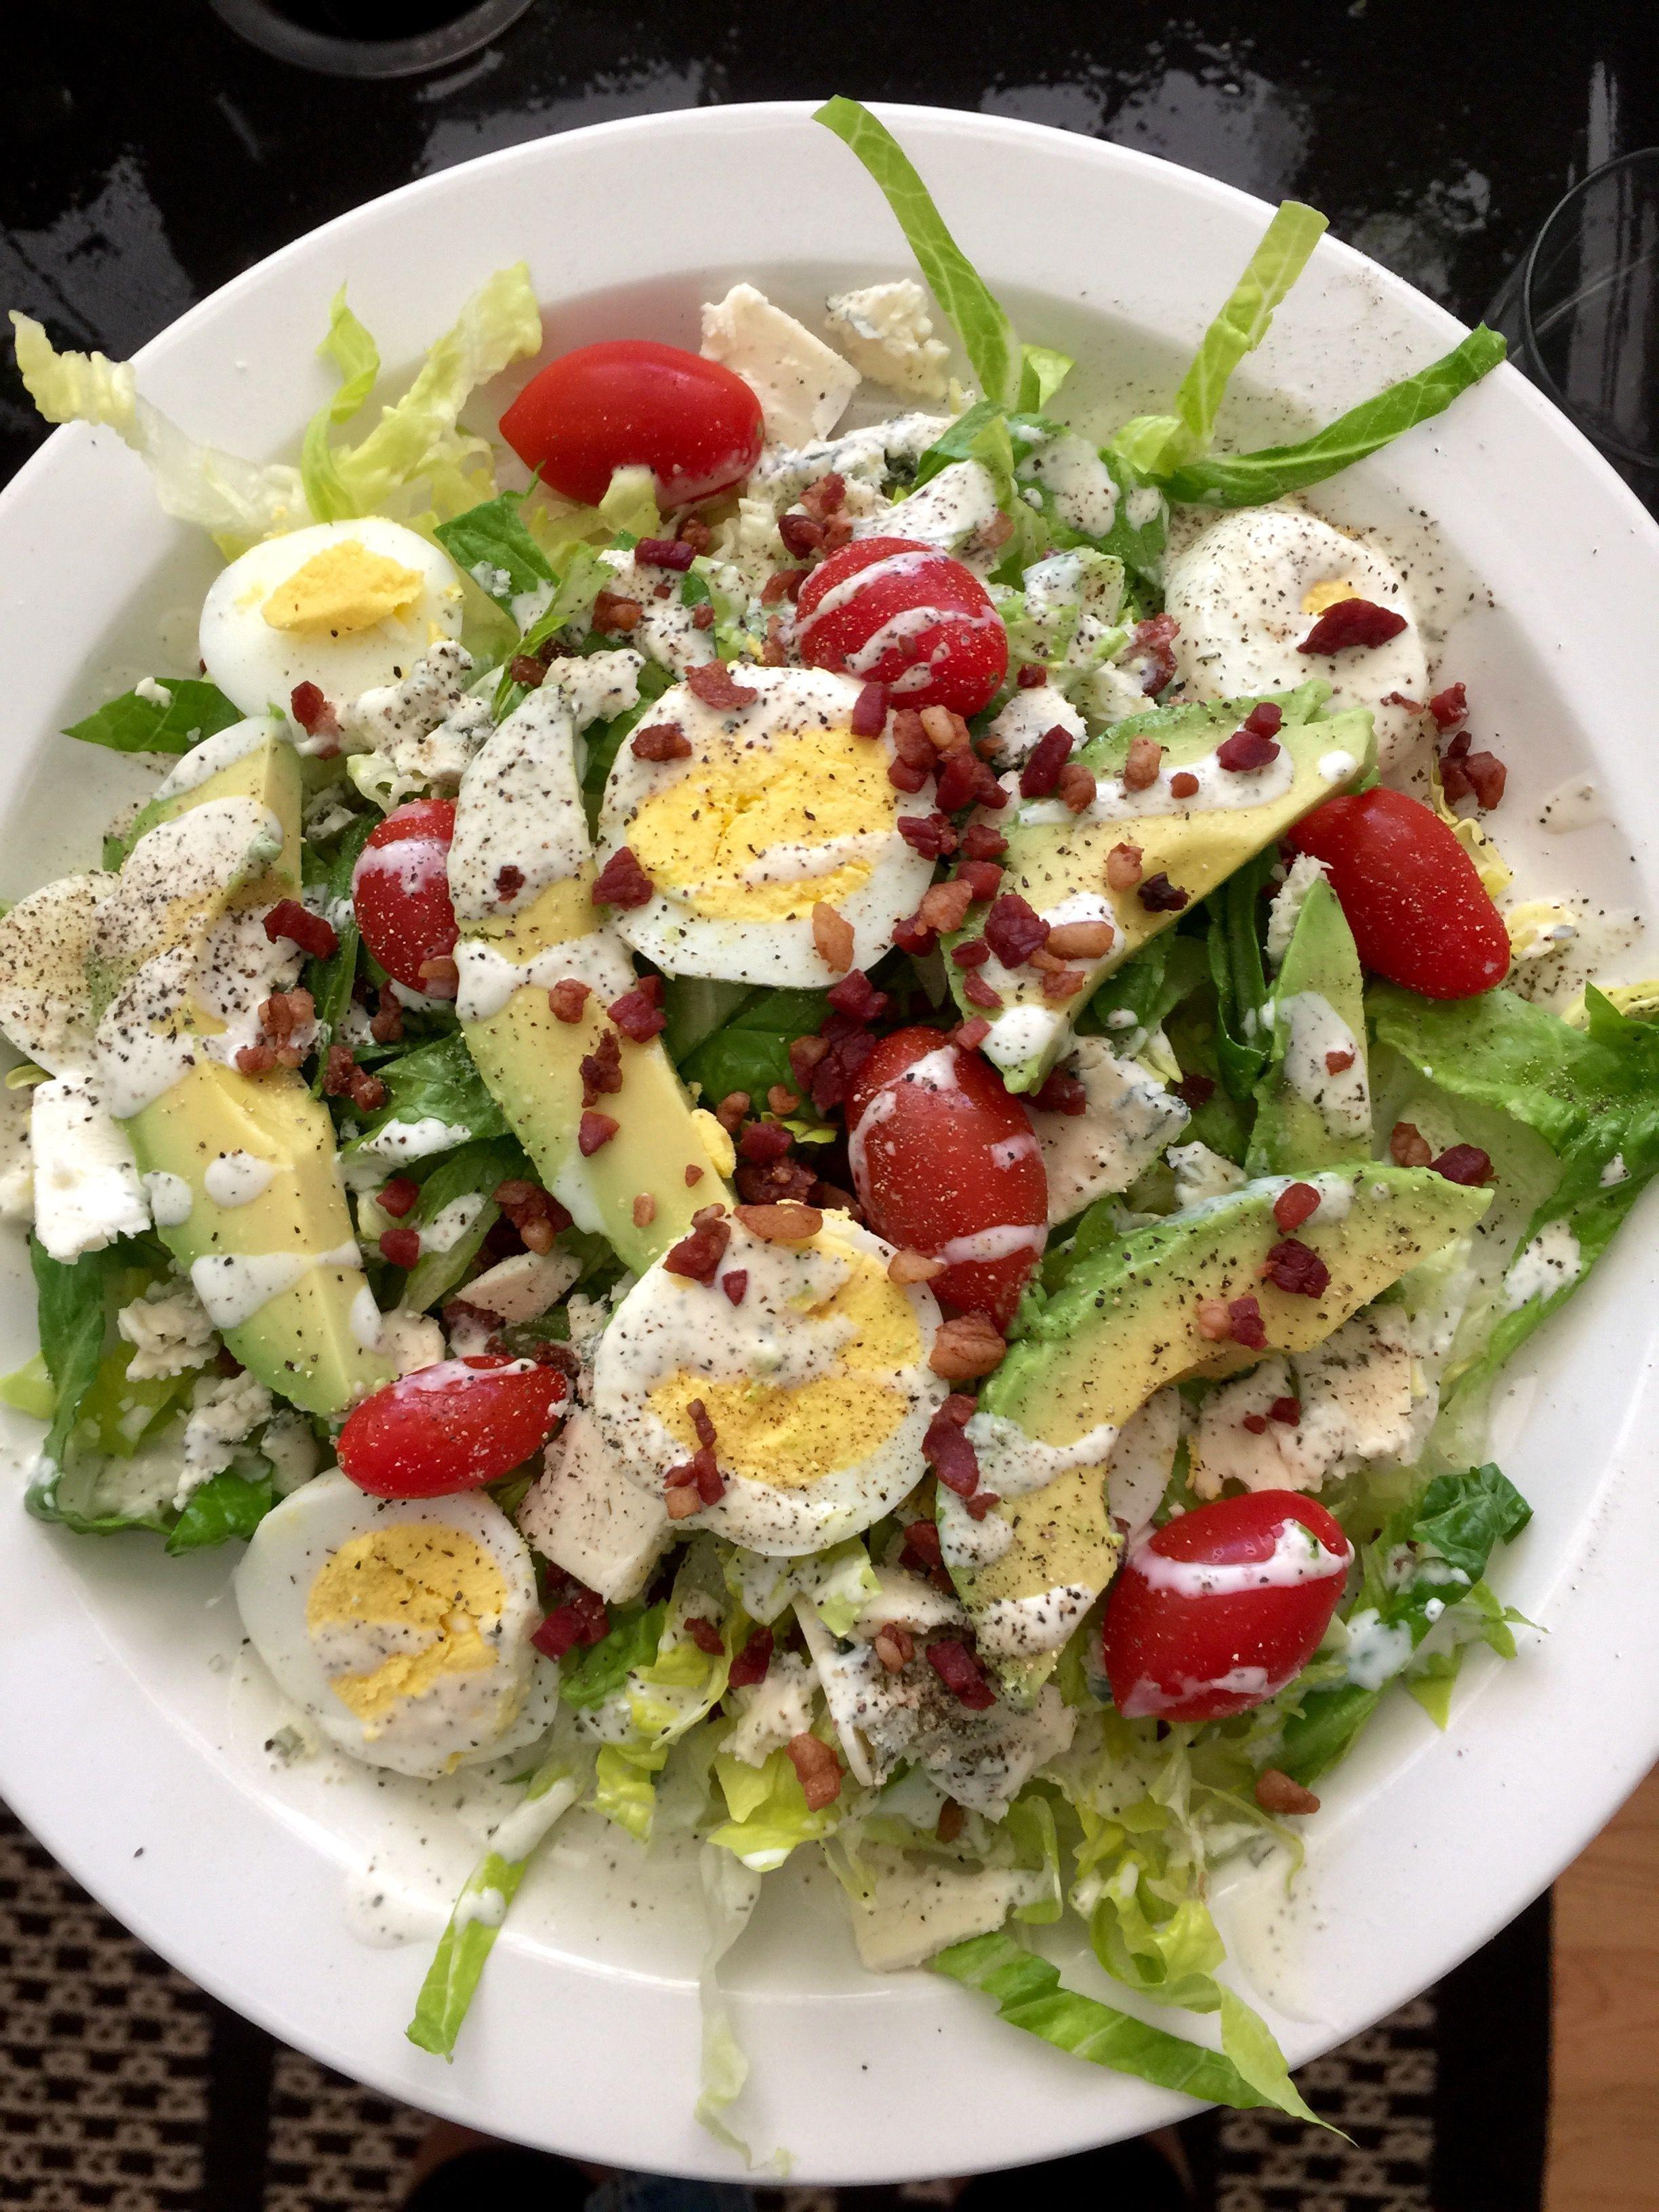 Cobb Salad South Beach Diet Recipes Salad Cobb Salad